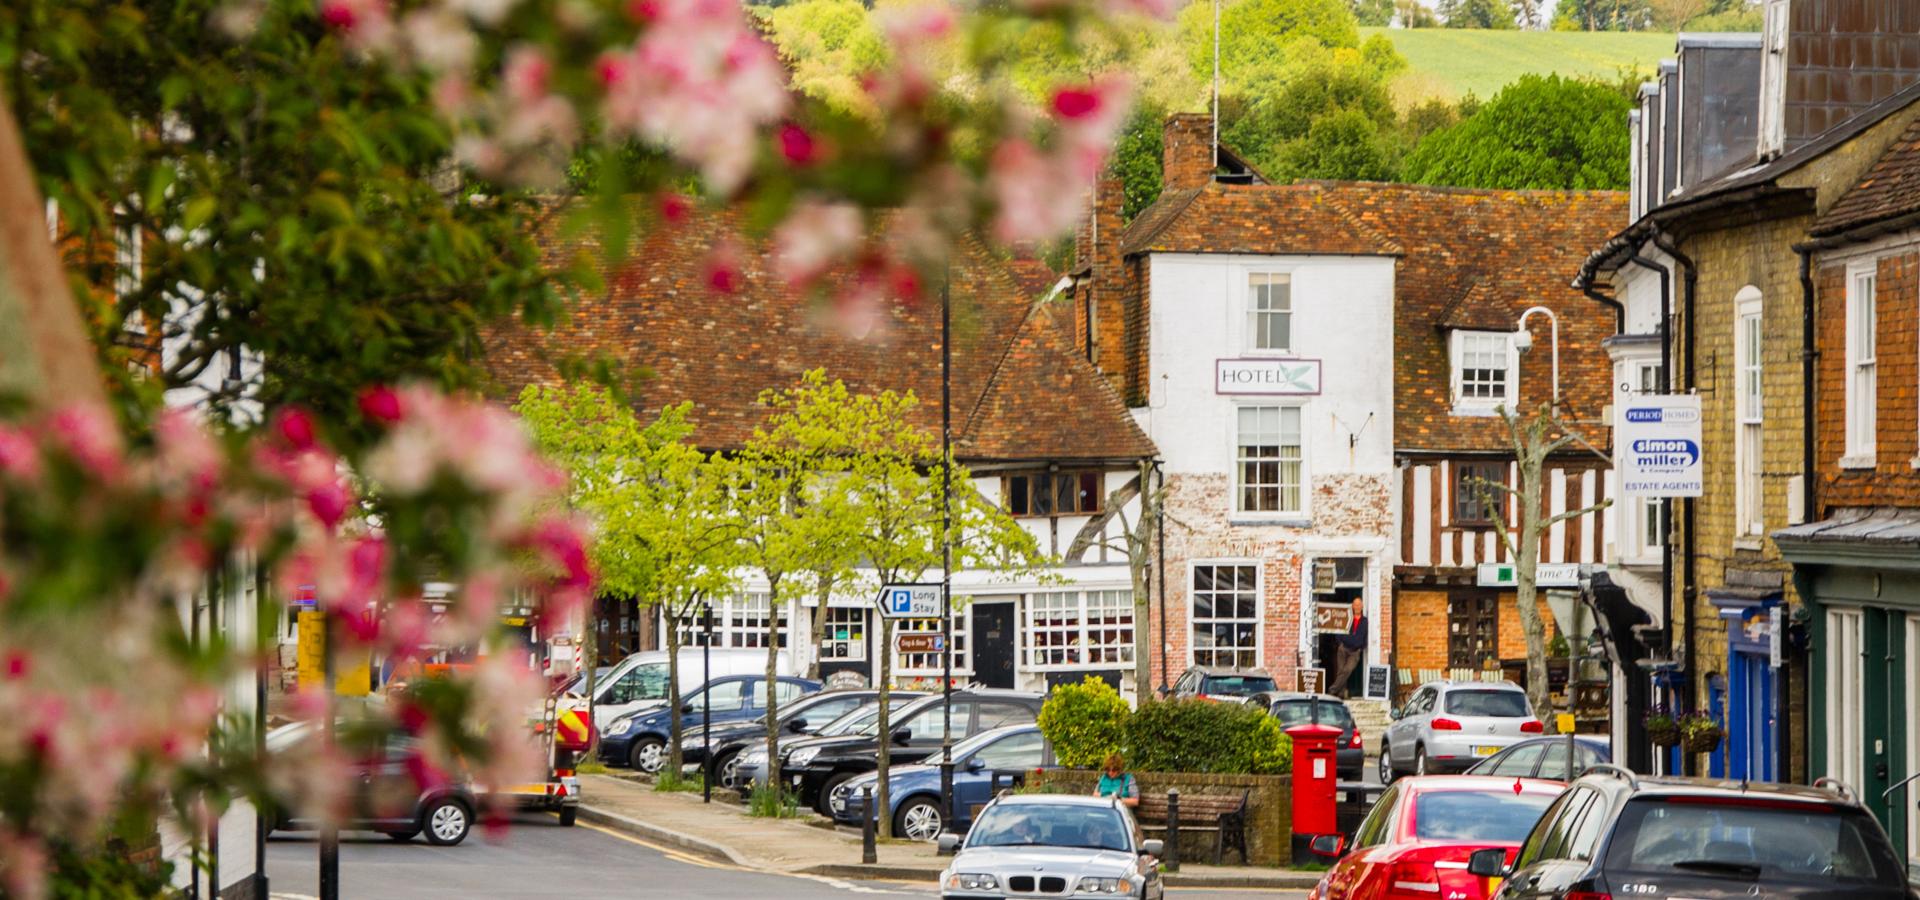 Peer-to-peer advisory in Lenham, Kent, England, Great Britain